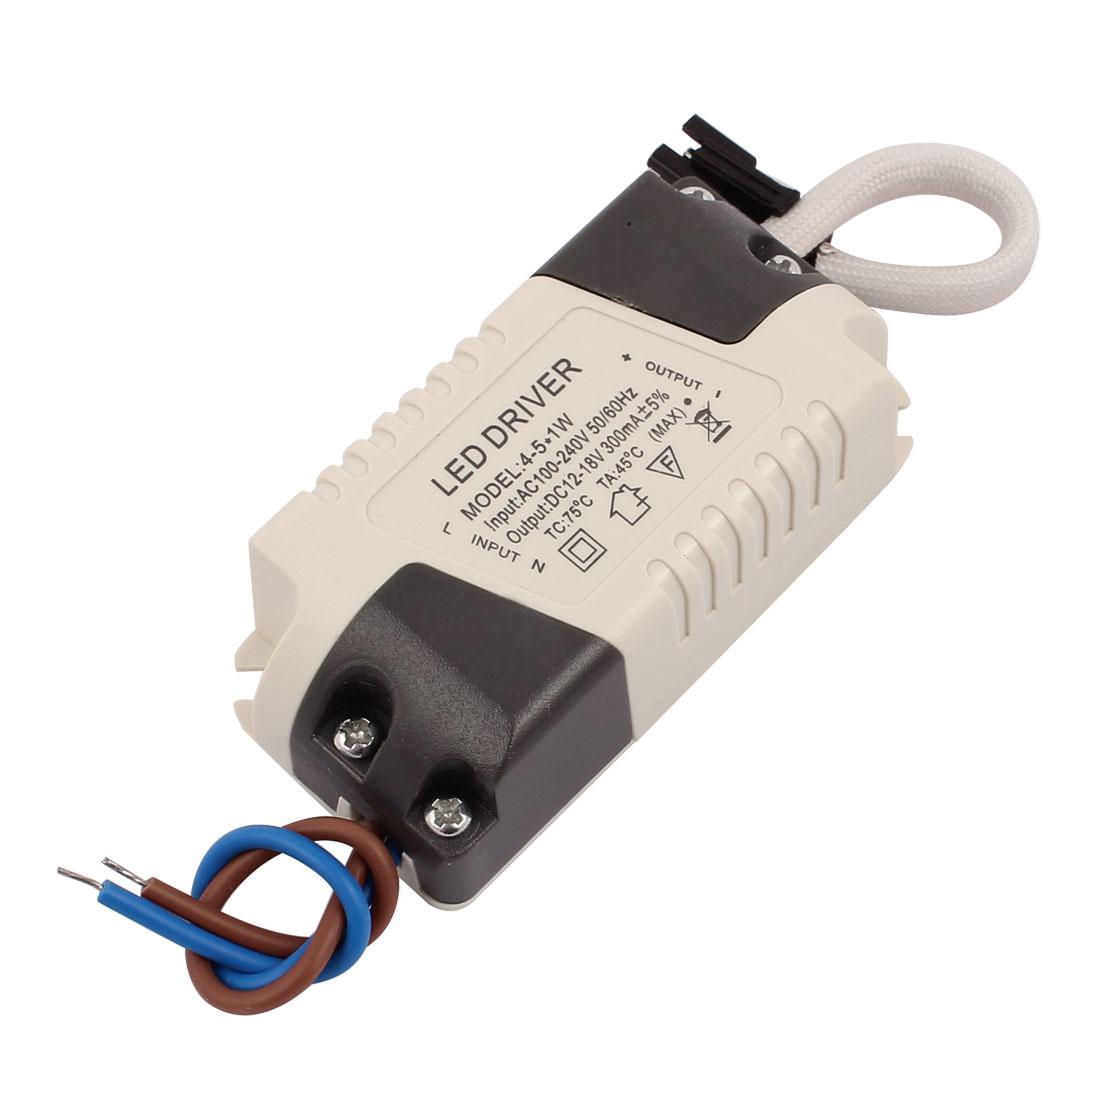 Power Supply Driver Adapter AC 100-240V to DC 12-18V for 4-5W LED Lightstripe